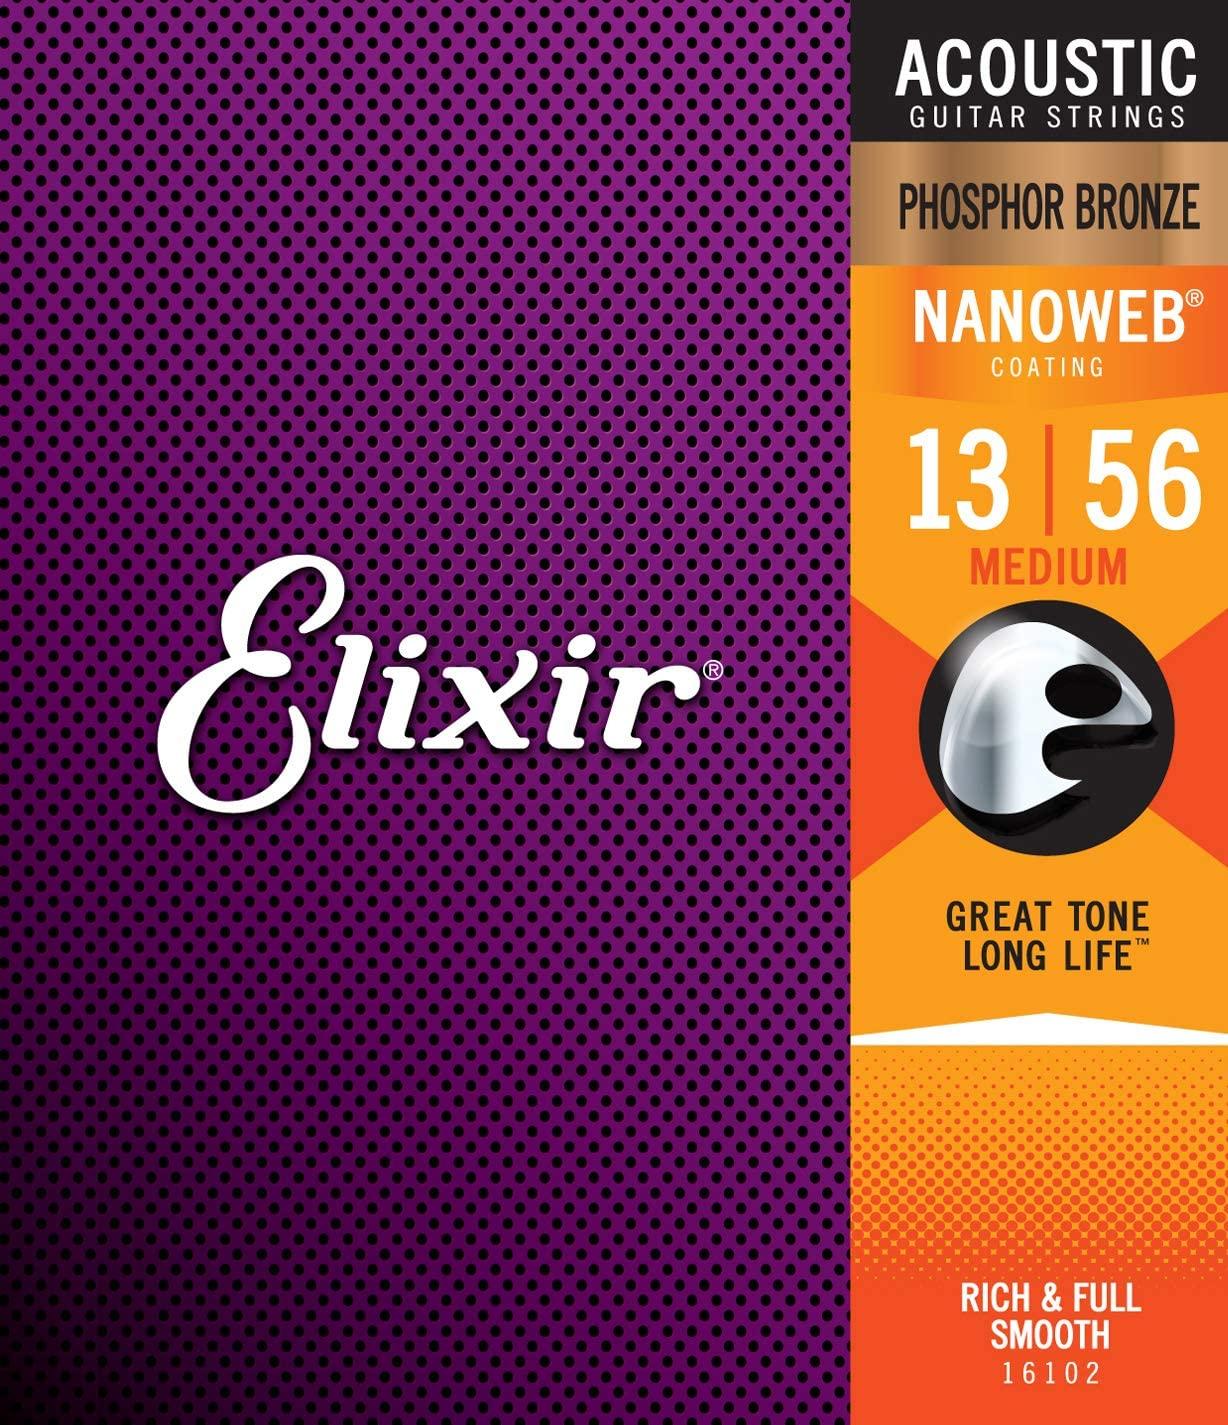 Elixir Phosphor Bronze Nanoweb Coated Acoustic Guitar Strings, Medium (13 - 56)